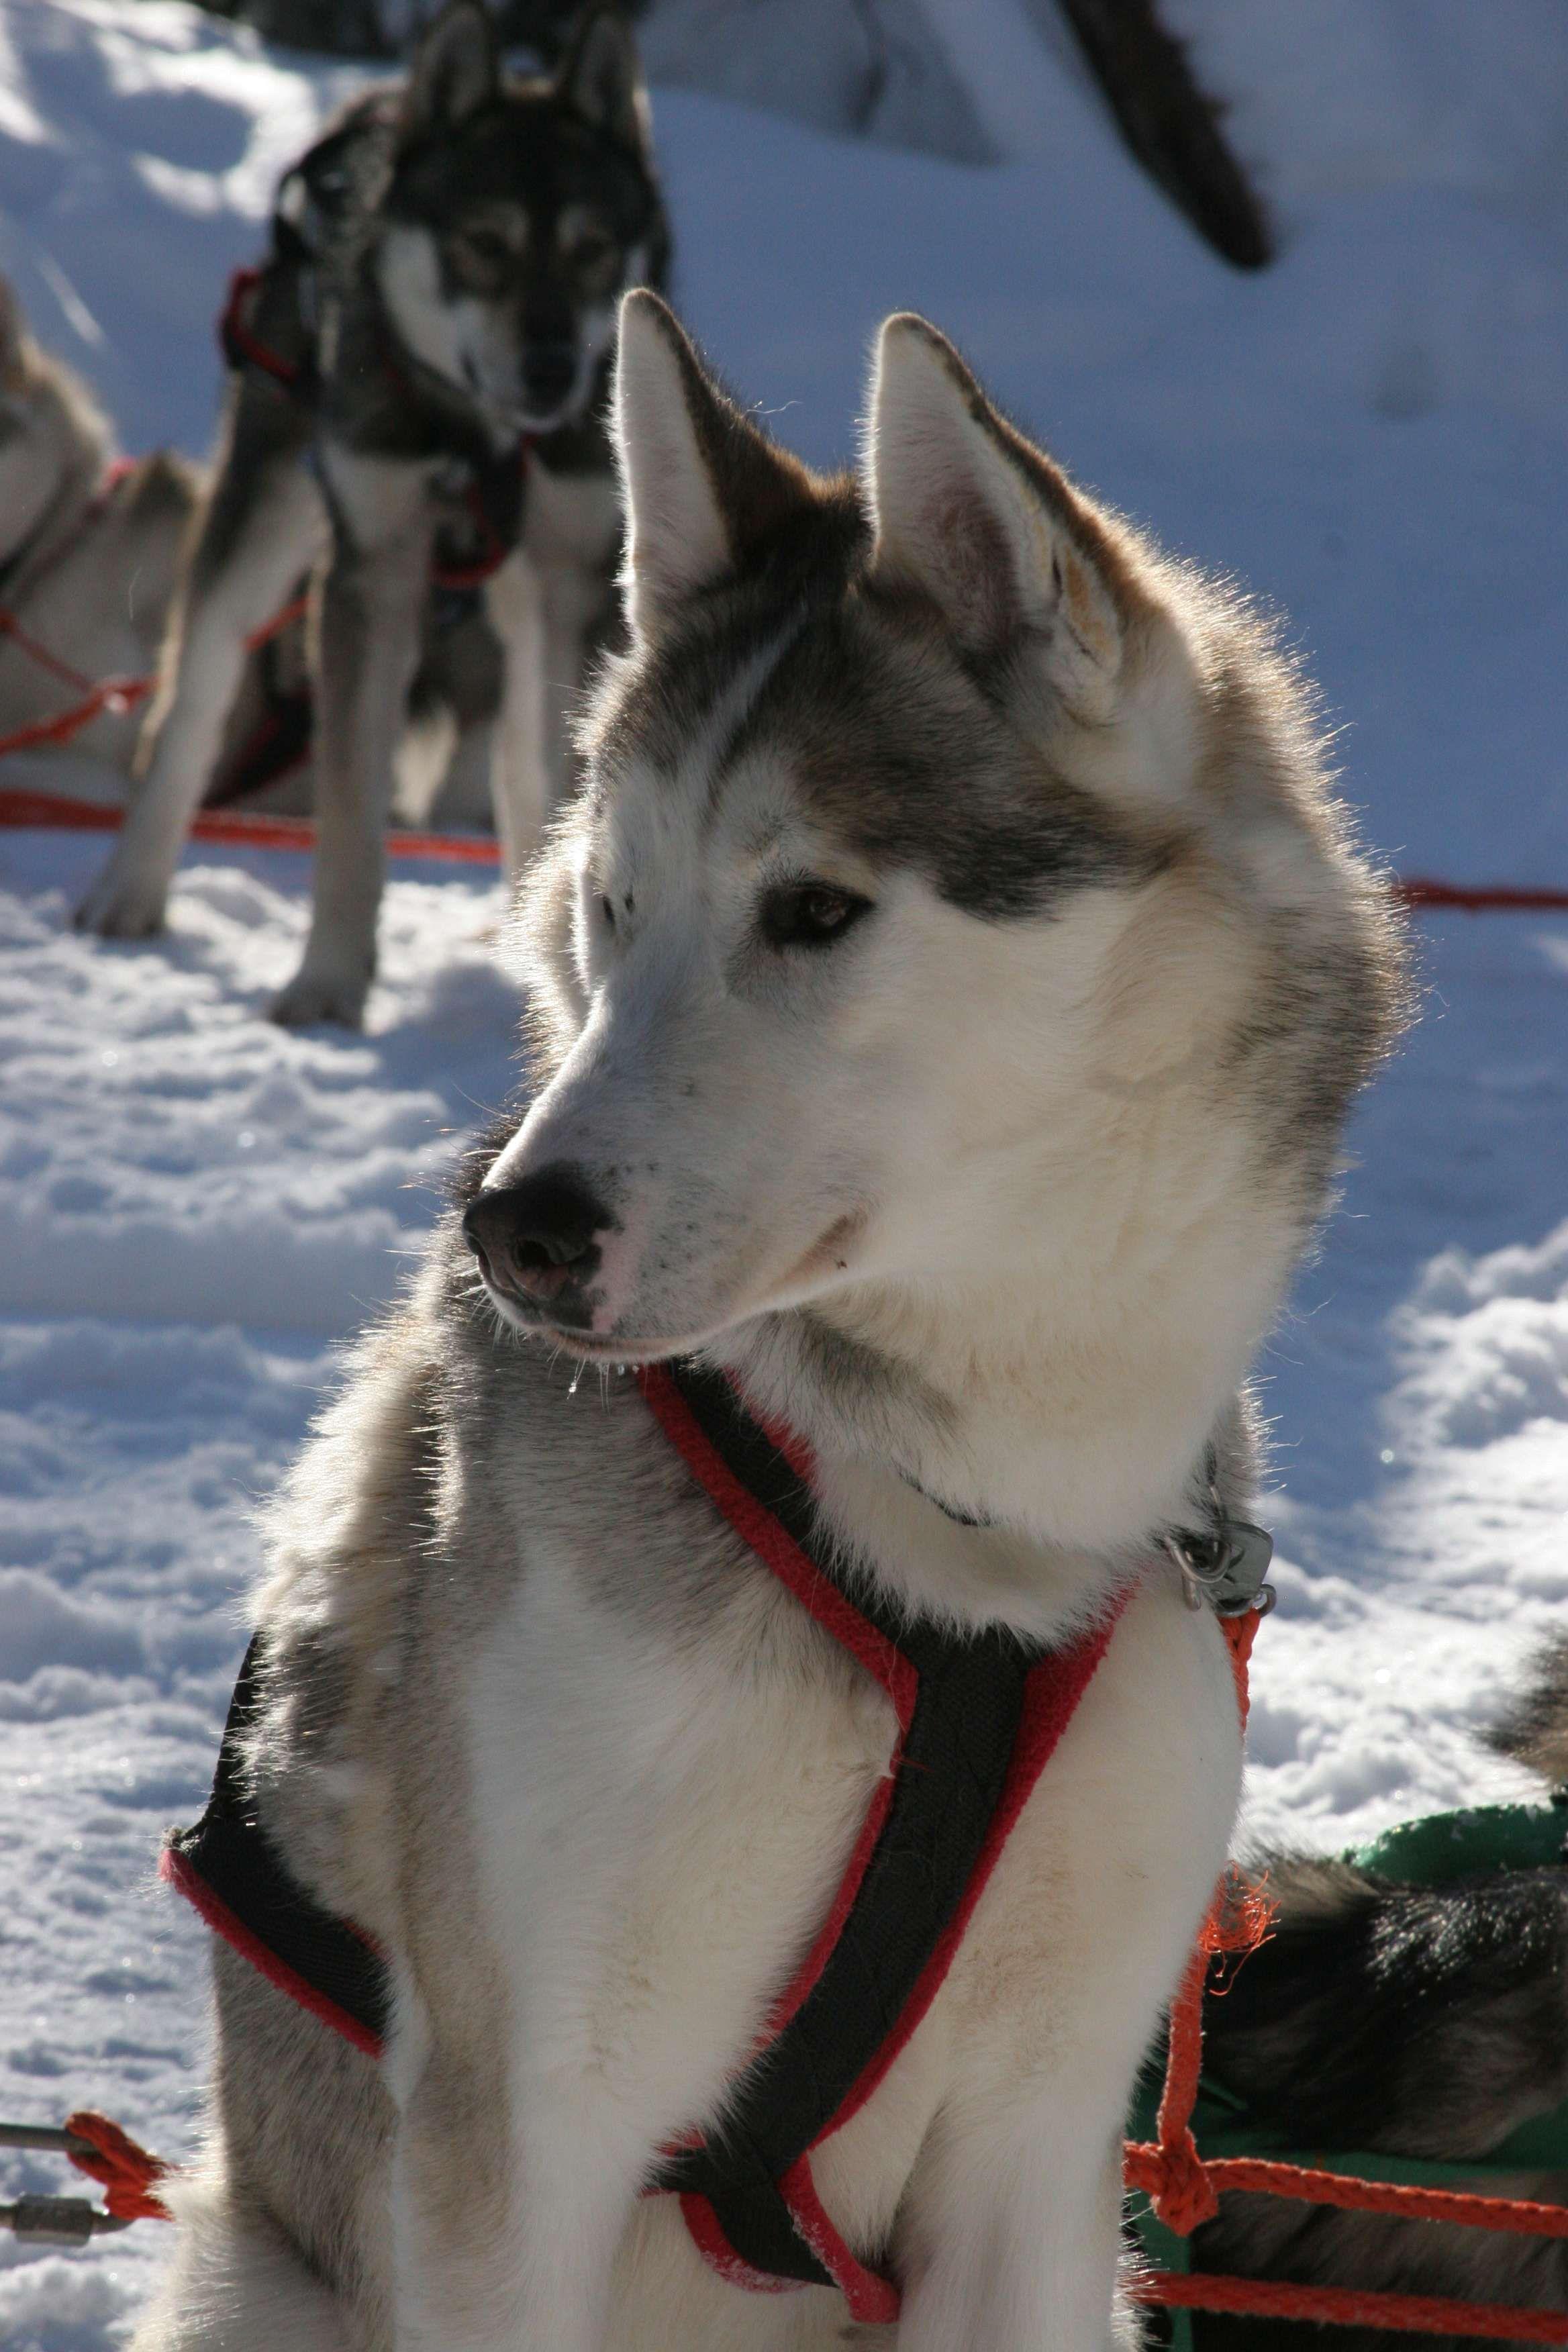 Chien à traineau Laponie Finlande Laponie finlande